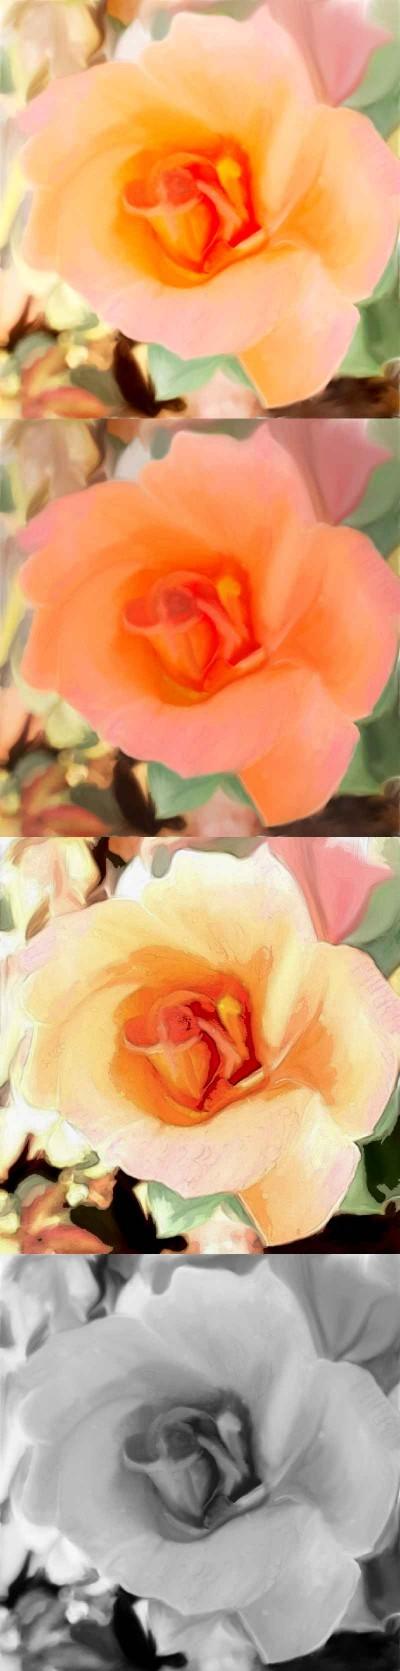 Rose in my garden | sulakshana | Digital Drawing | PENUP